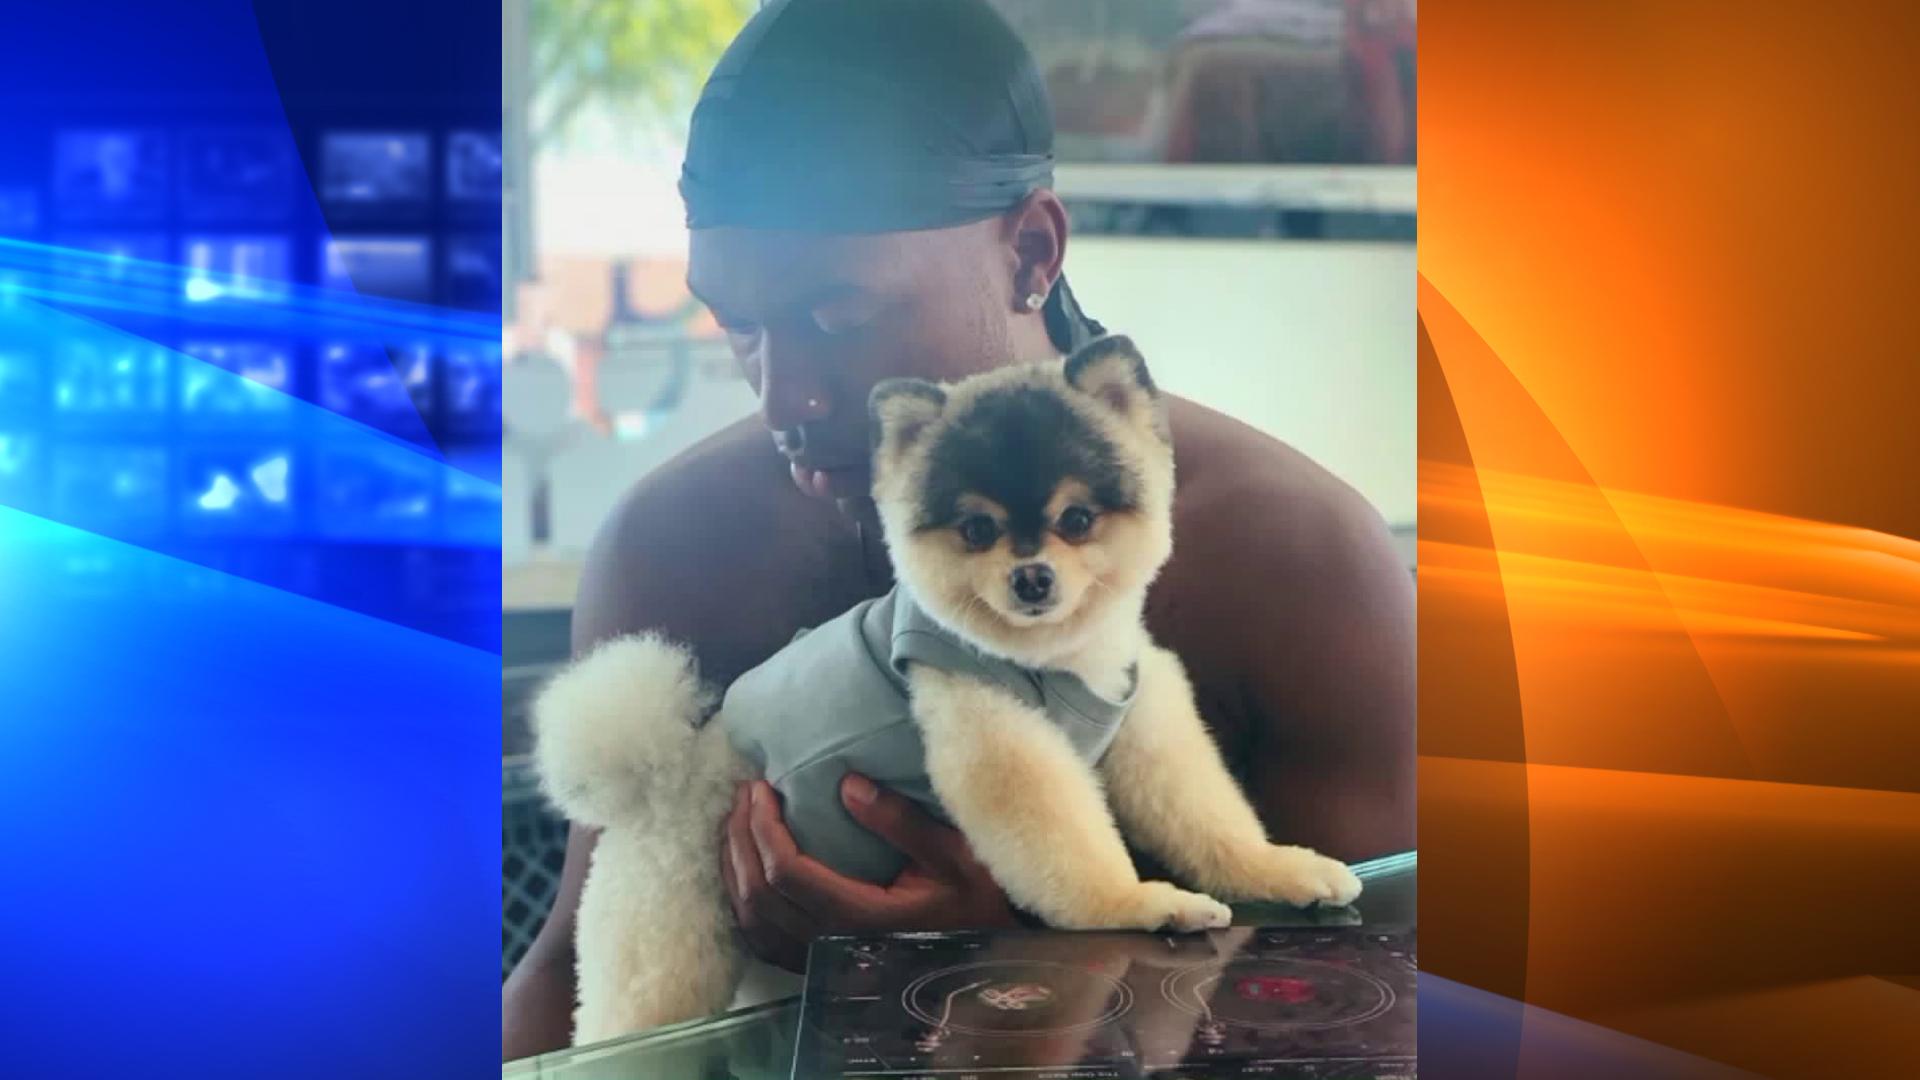 A photo of Daniel Sturridge and his dog Lucci.